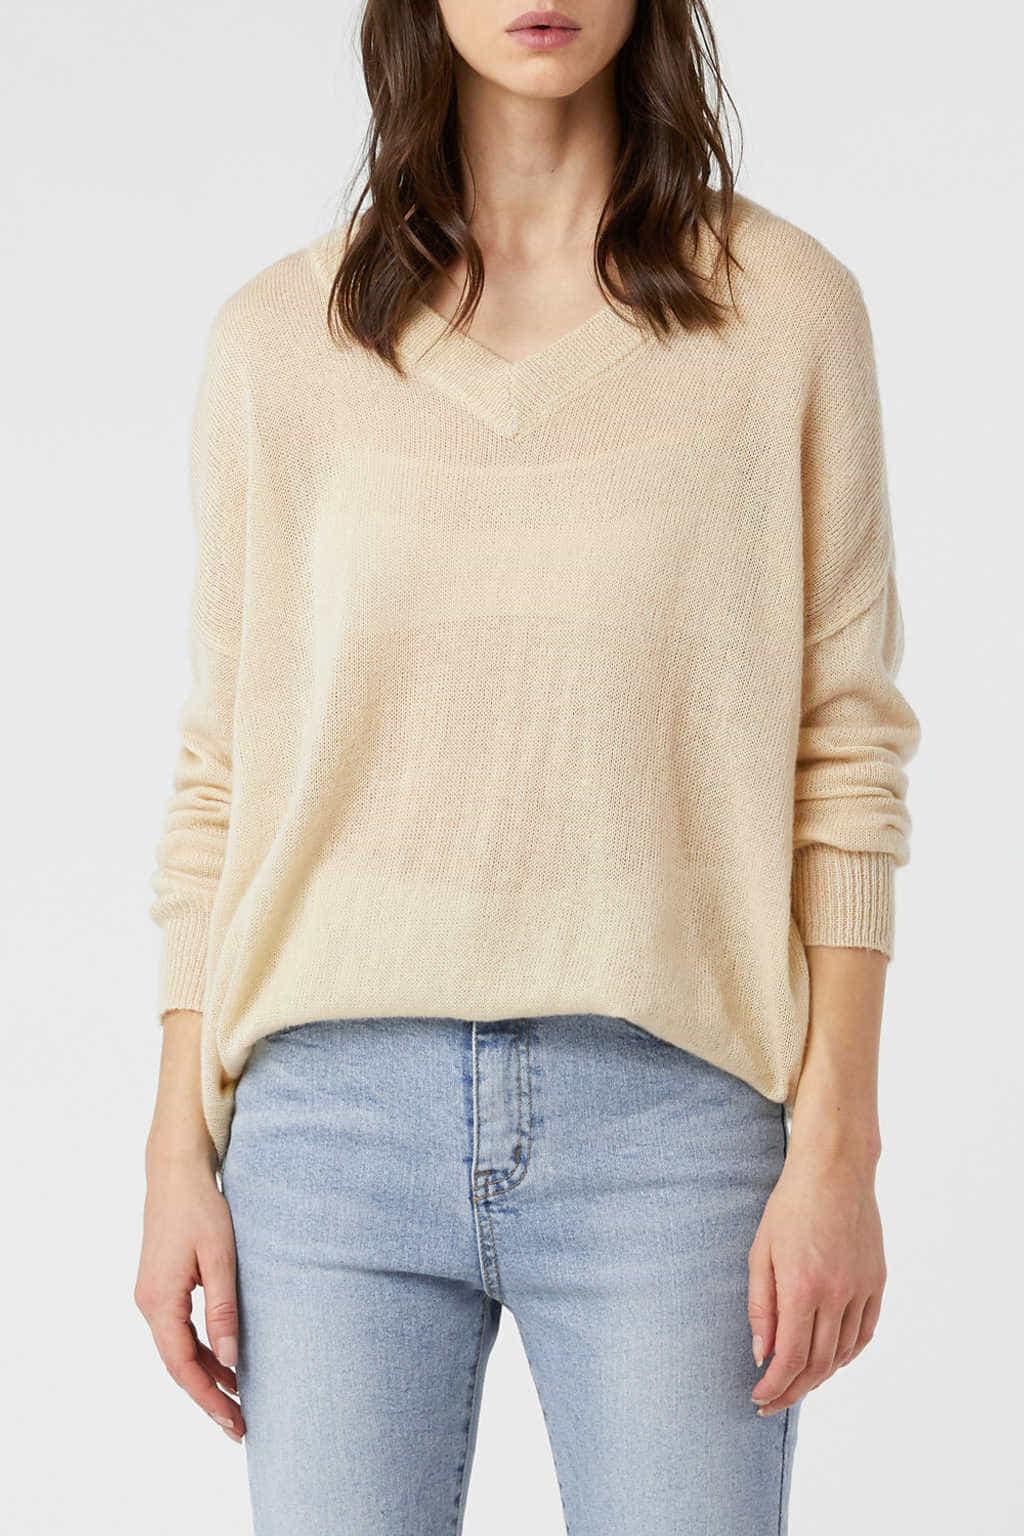 Sweater 2980 Cream 3